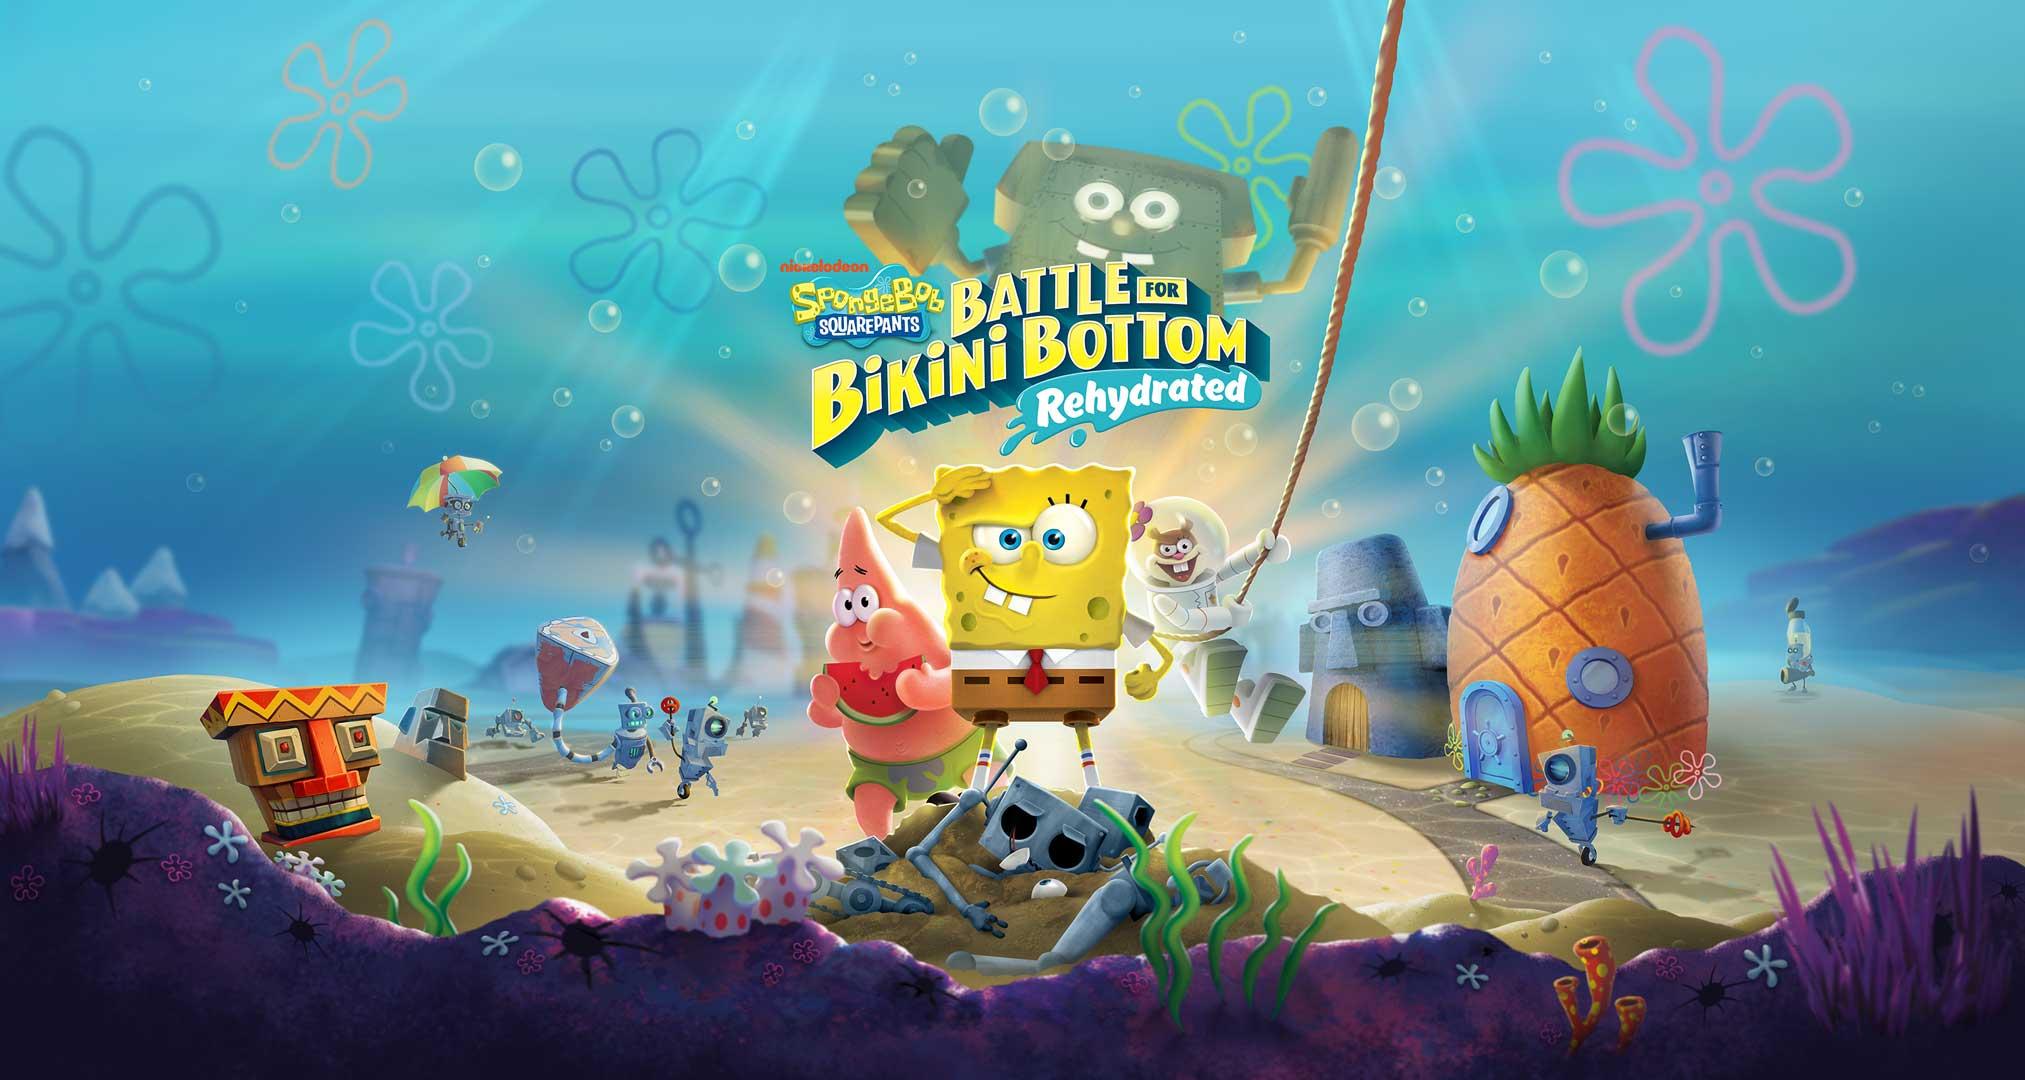 Spongebob Squarepants: Battle for Bikini Bottom Re-Hydrated